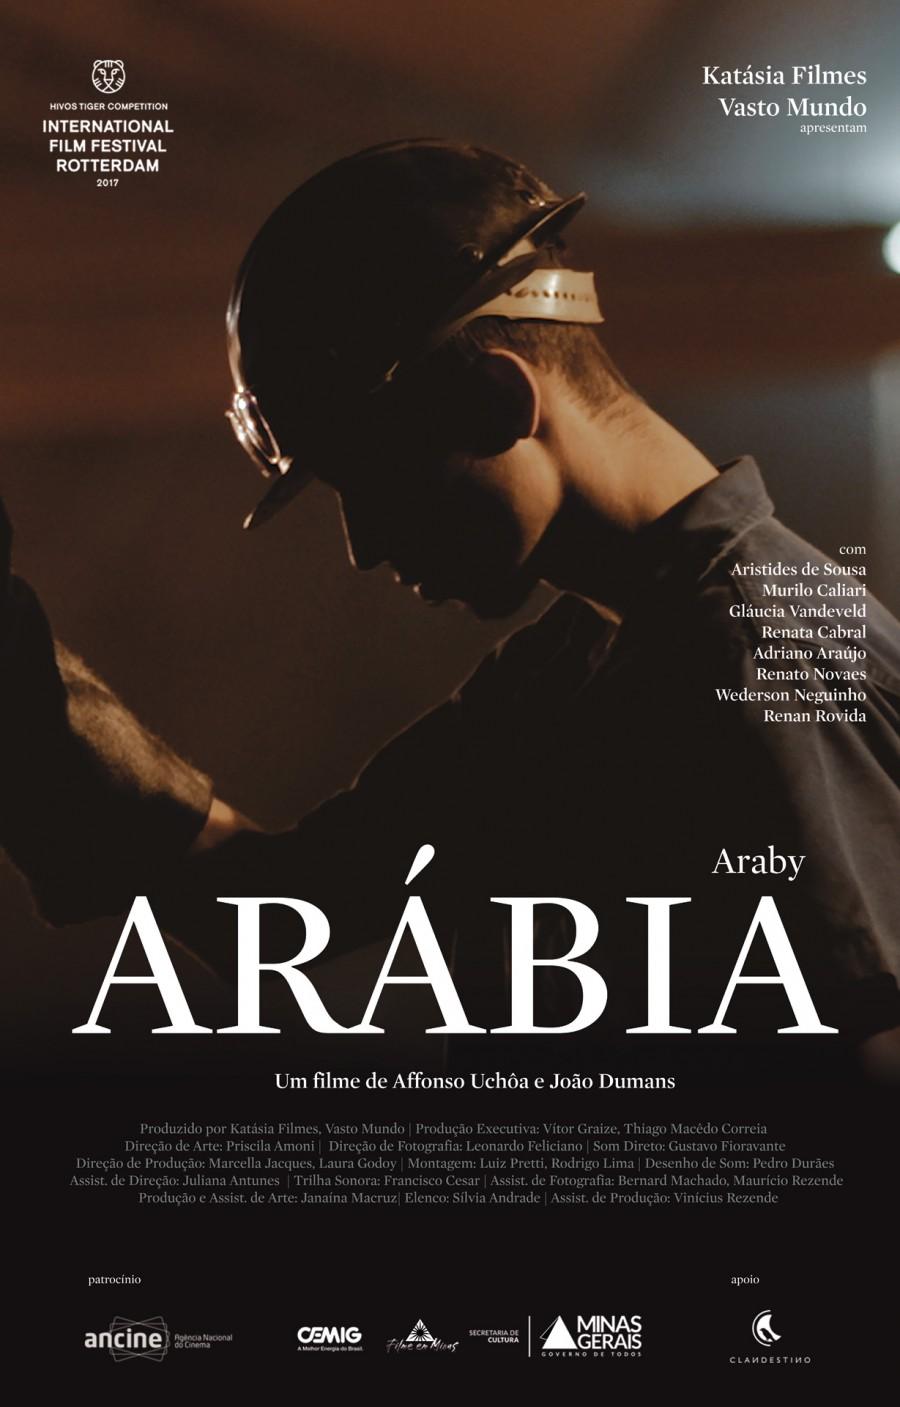 ARABIA poster.jpg